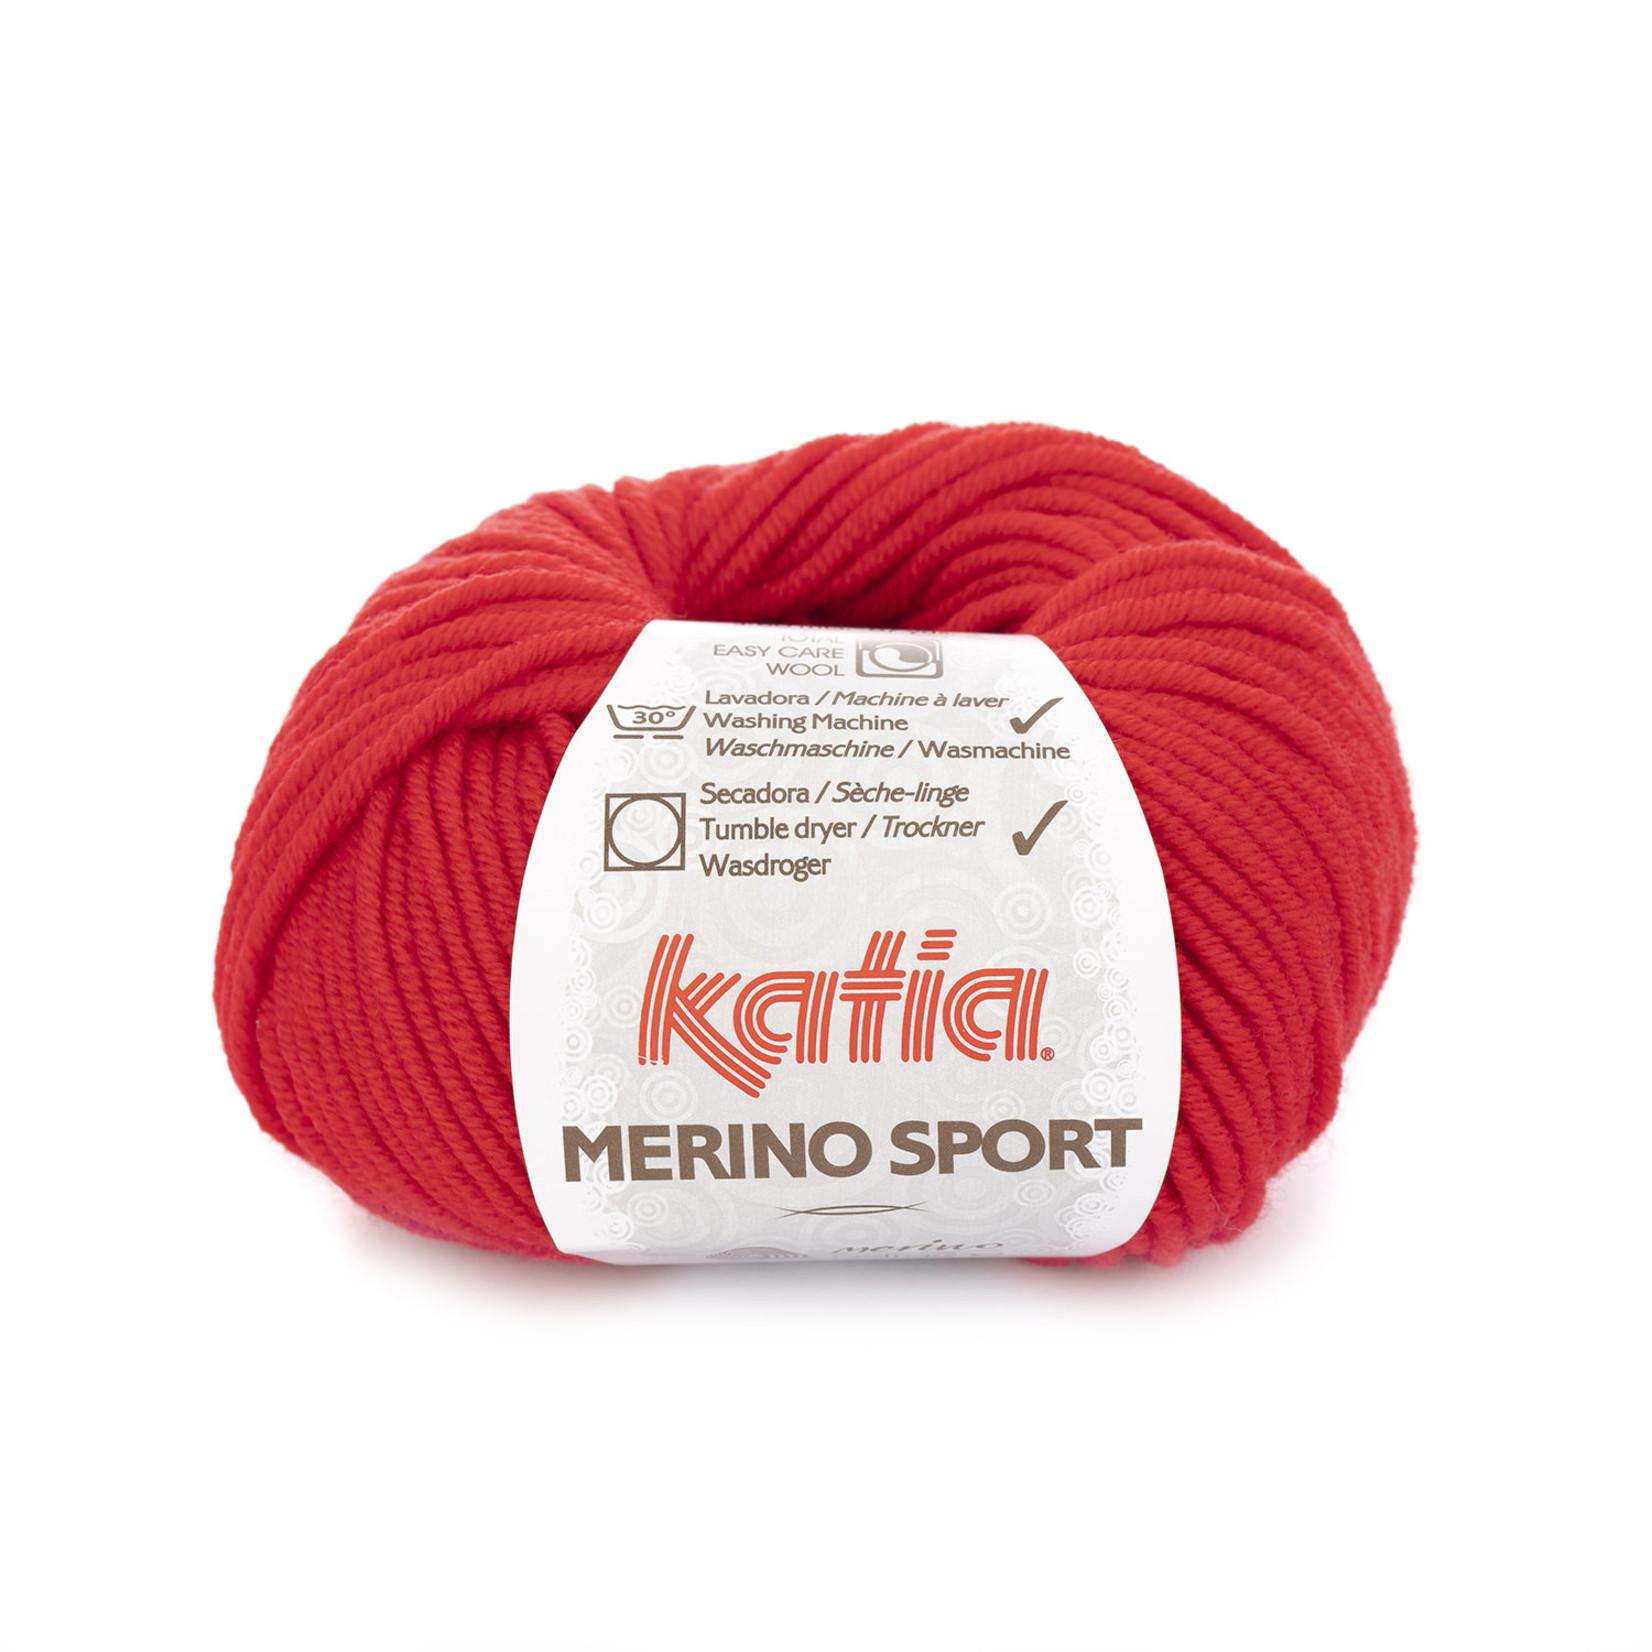 Katia Katia - Merino Sport - 4 Rood - 50 gr.